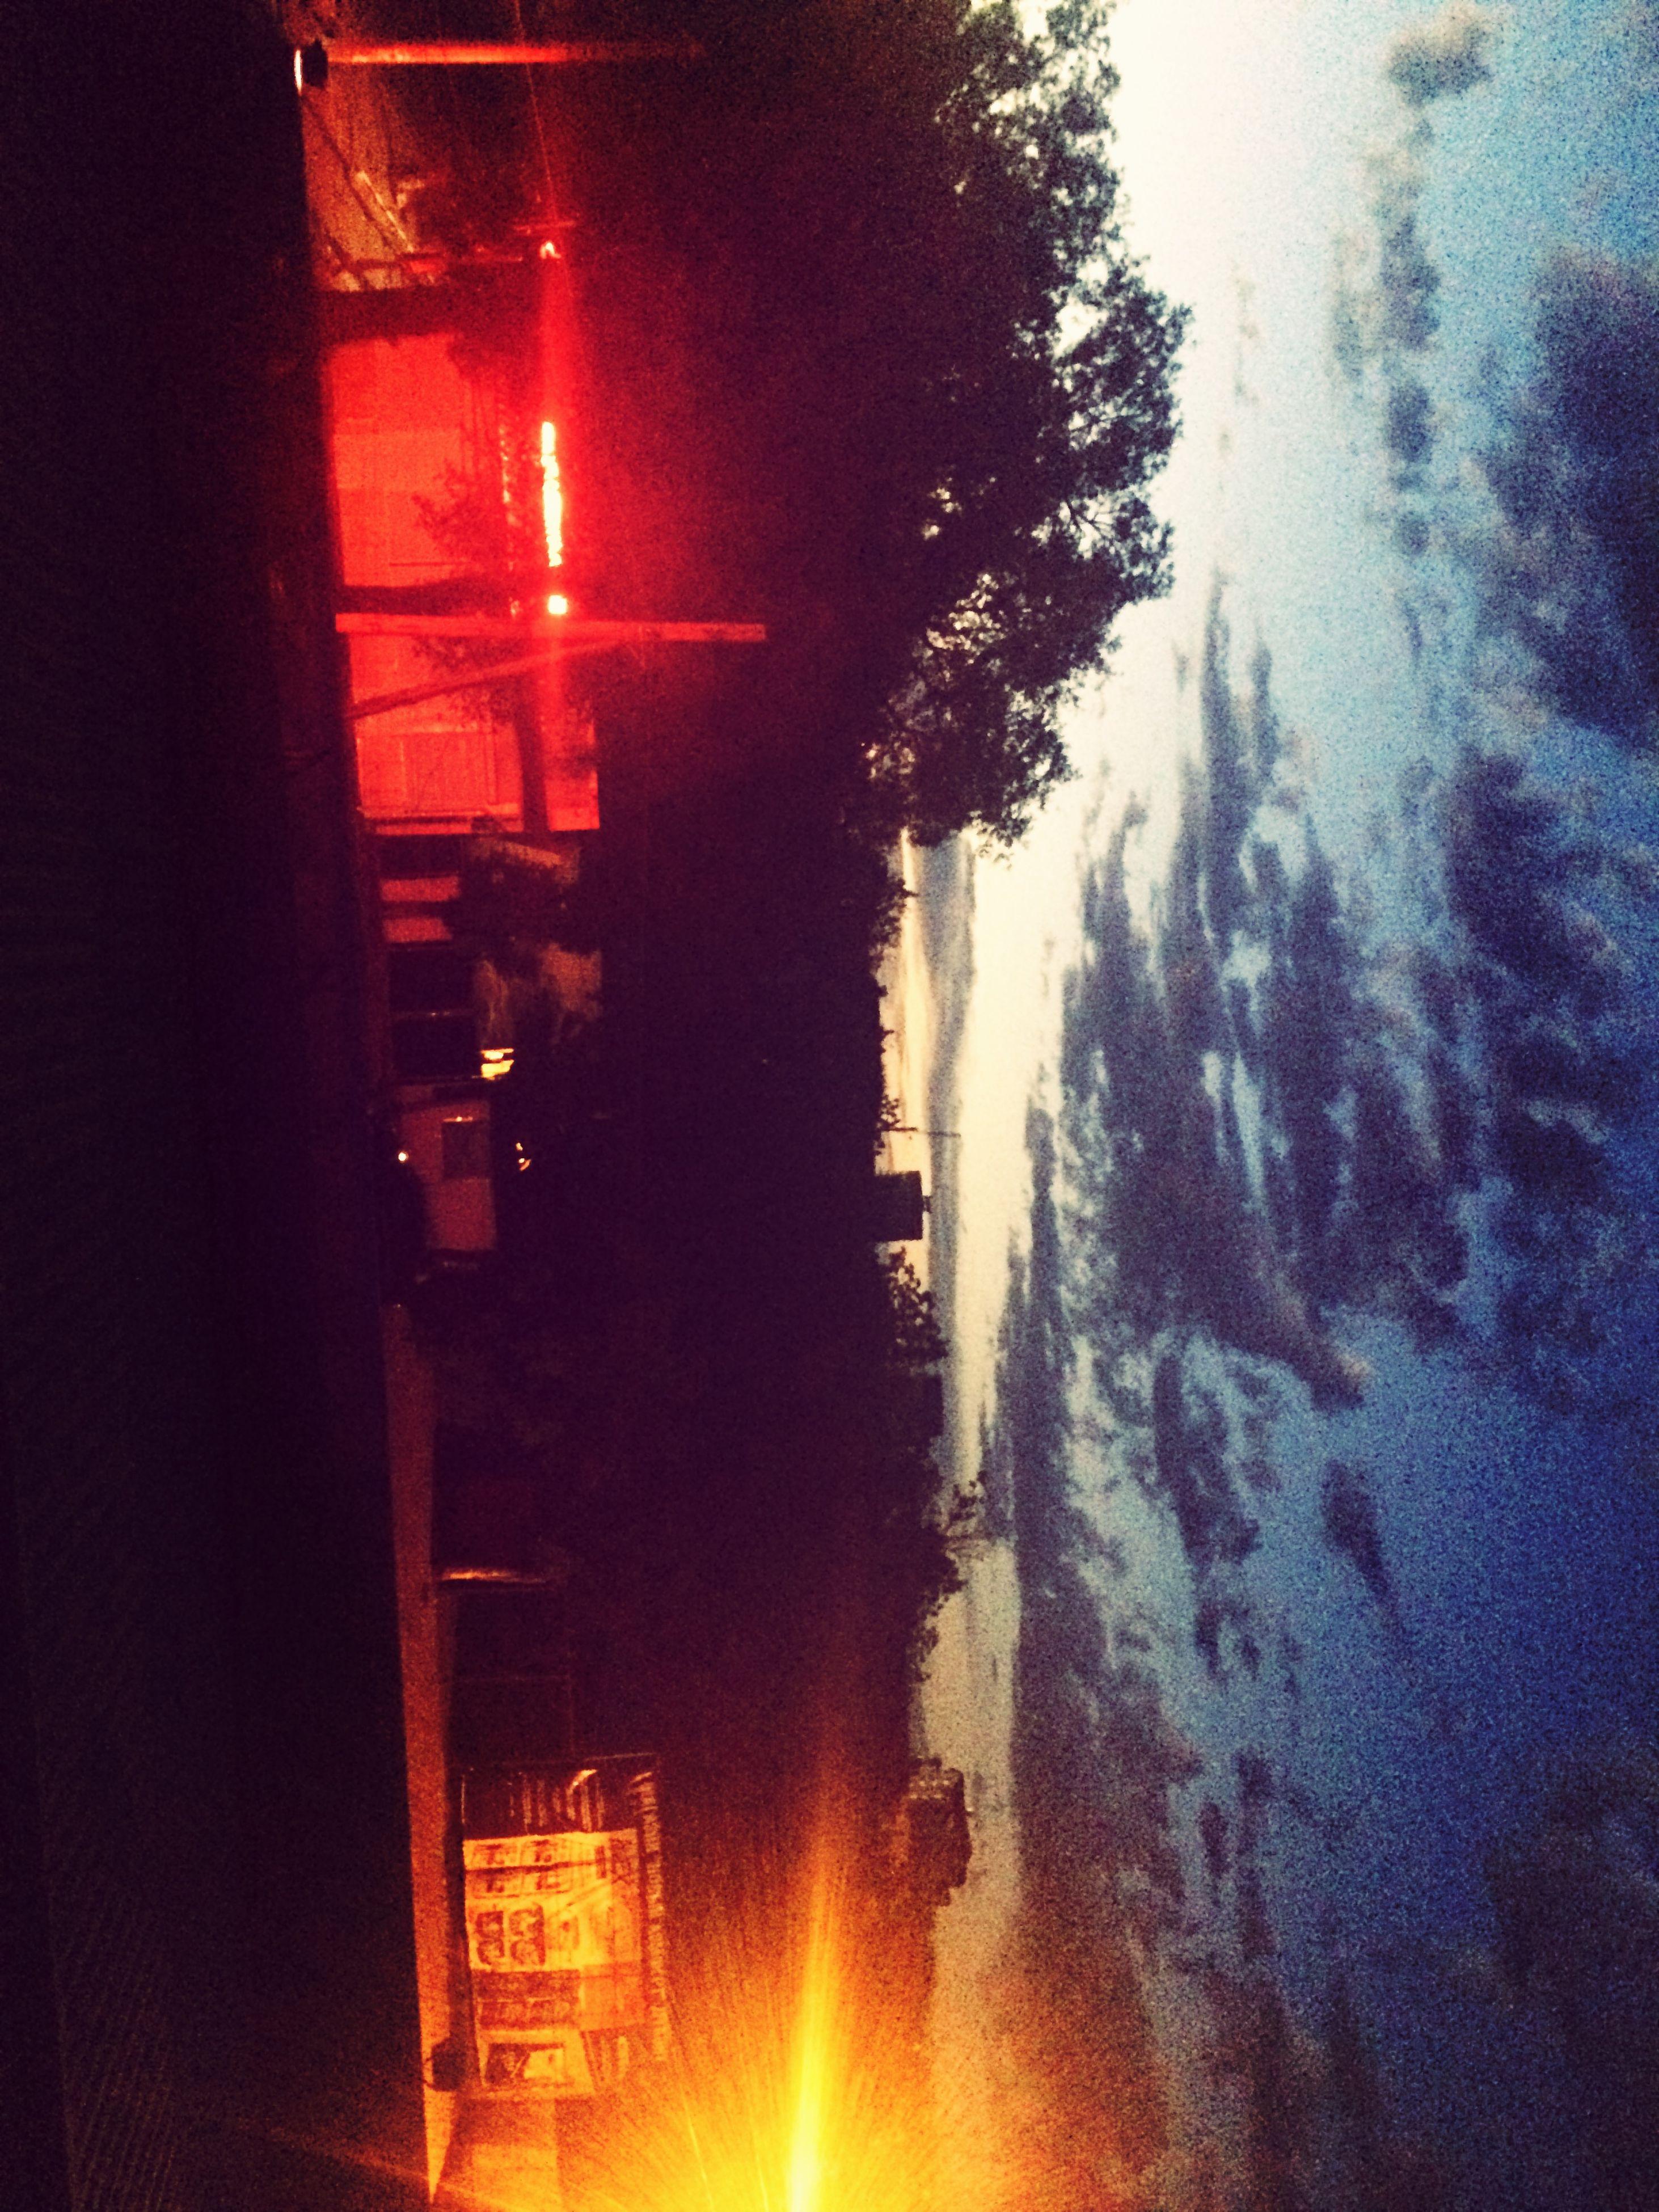 illuminated, snow, winter, cold temperature, building exterior, season, night, built structure, architecture, tree, street, sunset, weather, house, transportation, lighting equipment, street light, land vehicle, car, lens flare